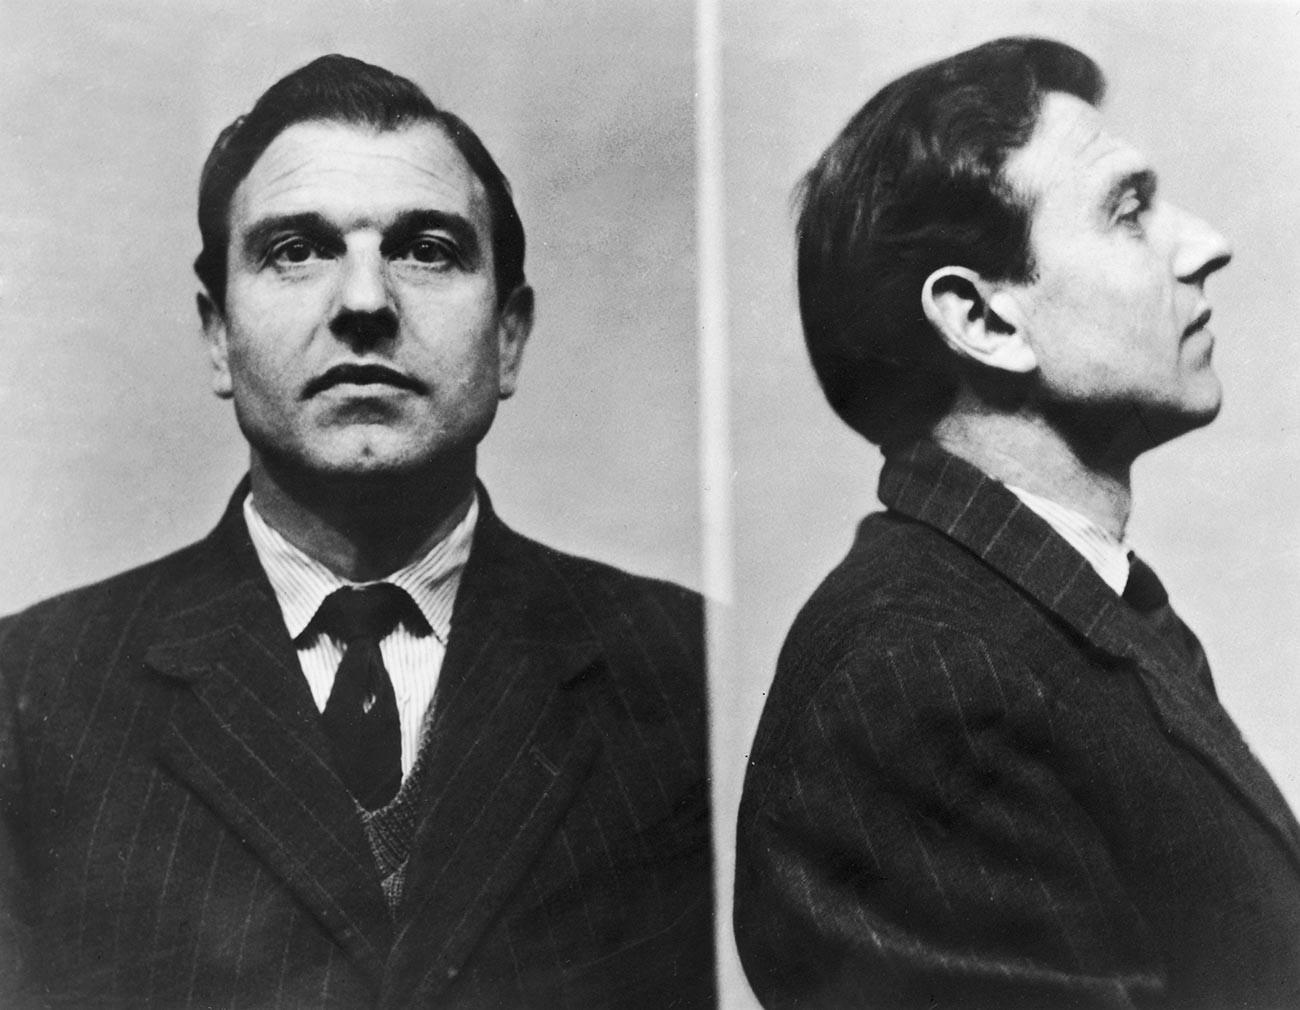 Photo de George Blake après son arrestation en 1961